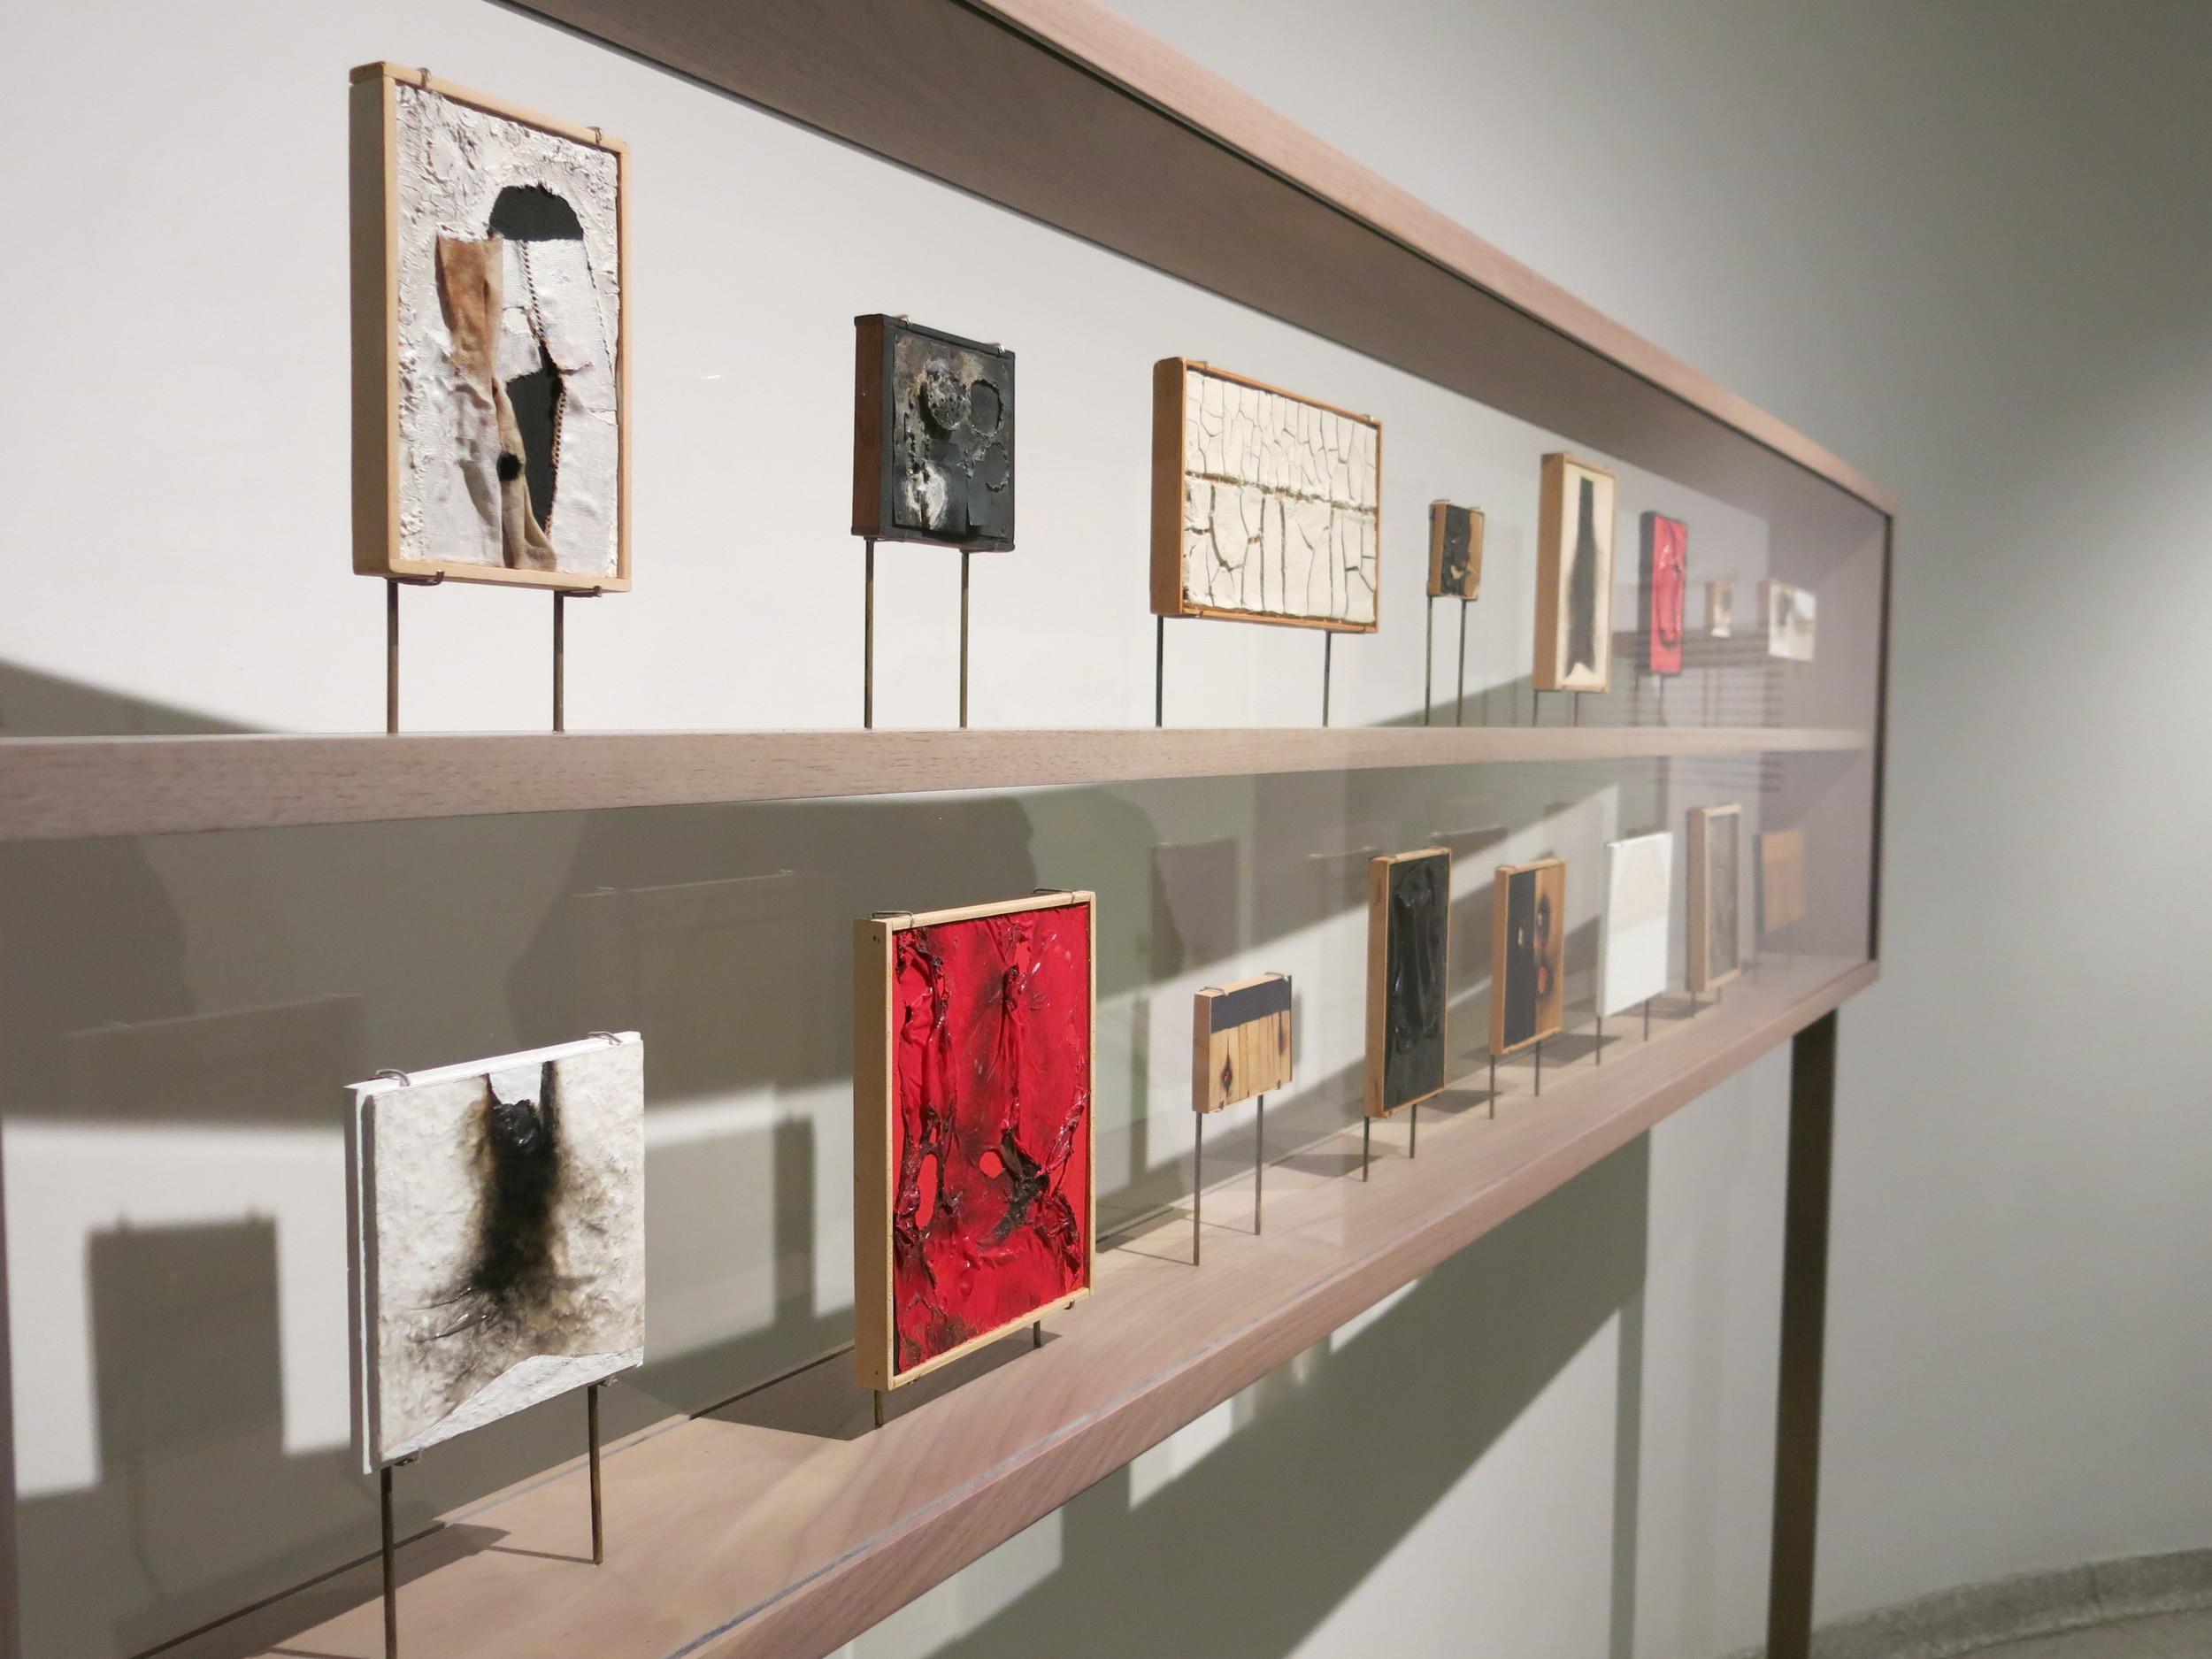 Aberto Burri's Miniature Sketches. Photo by Gabriel Reed